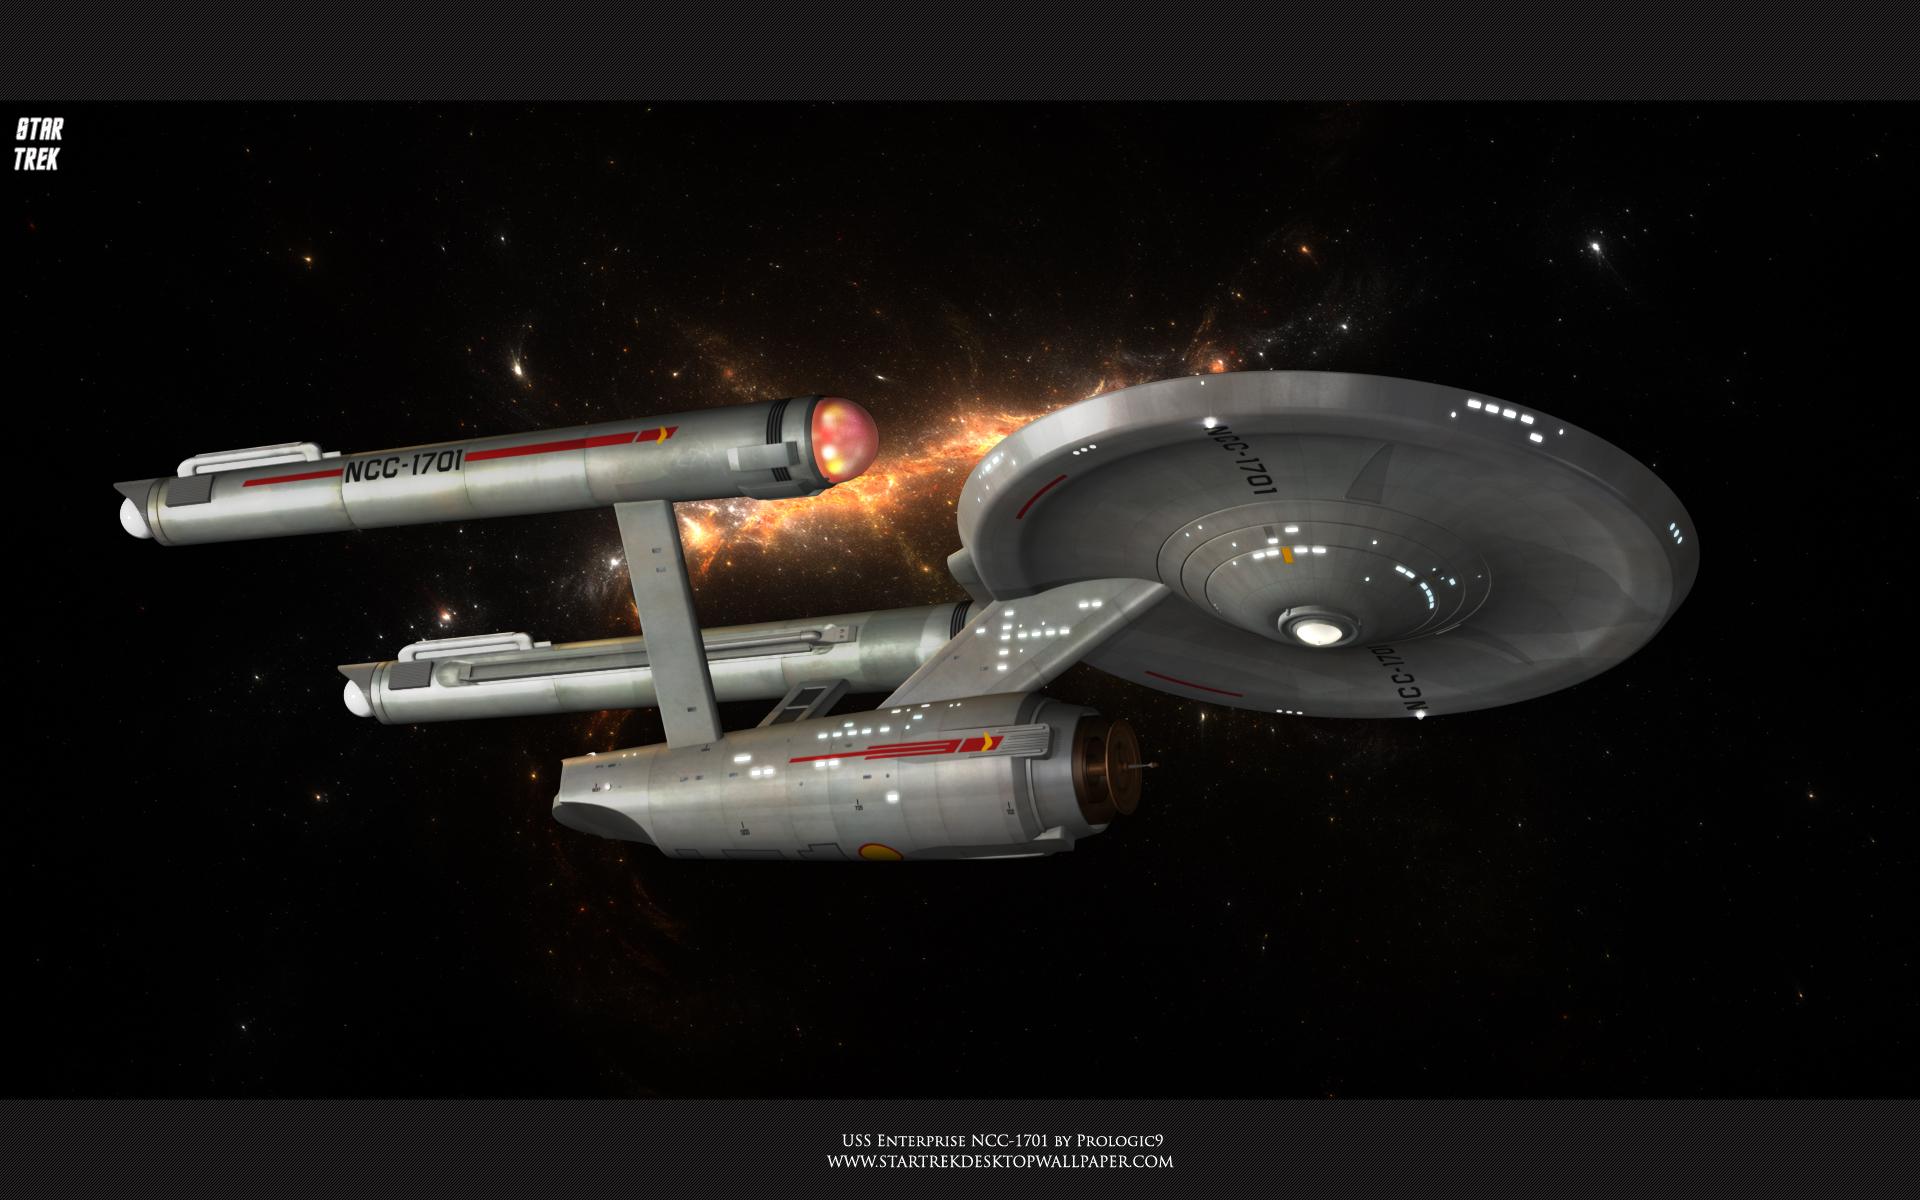 Uss Enterprise Ncc 1701 Hd Wallpaper Background Image